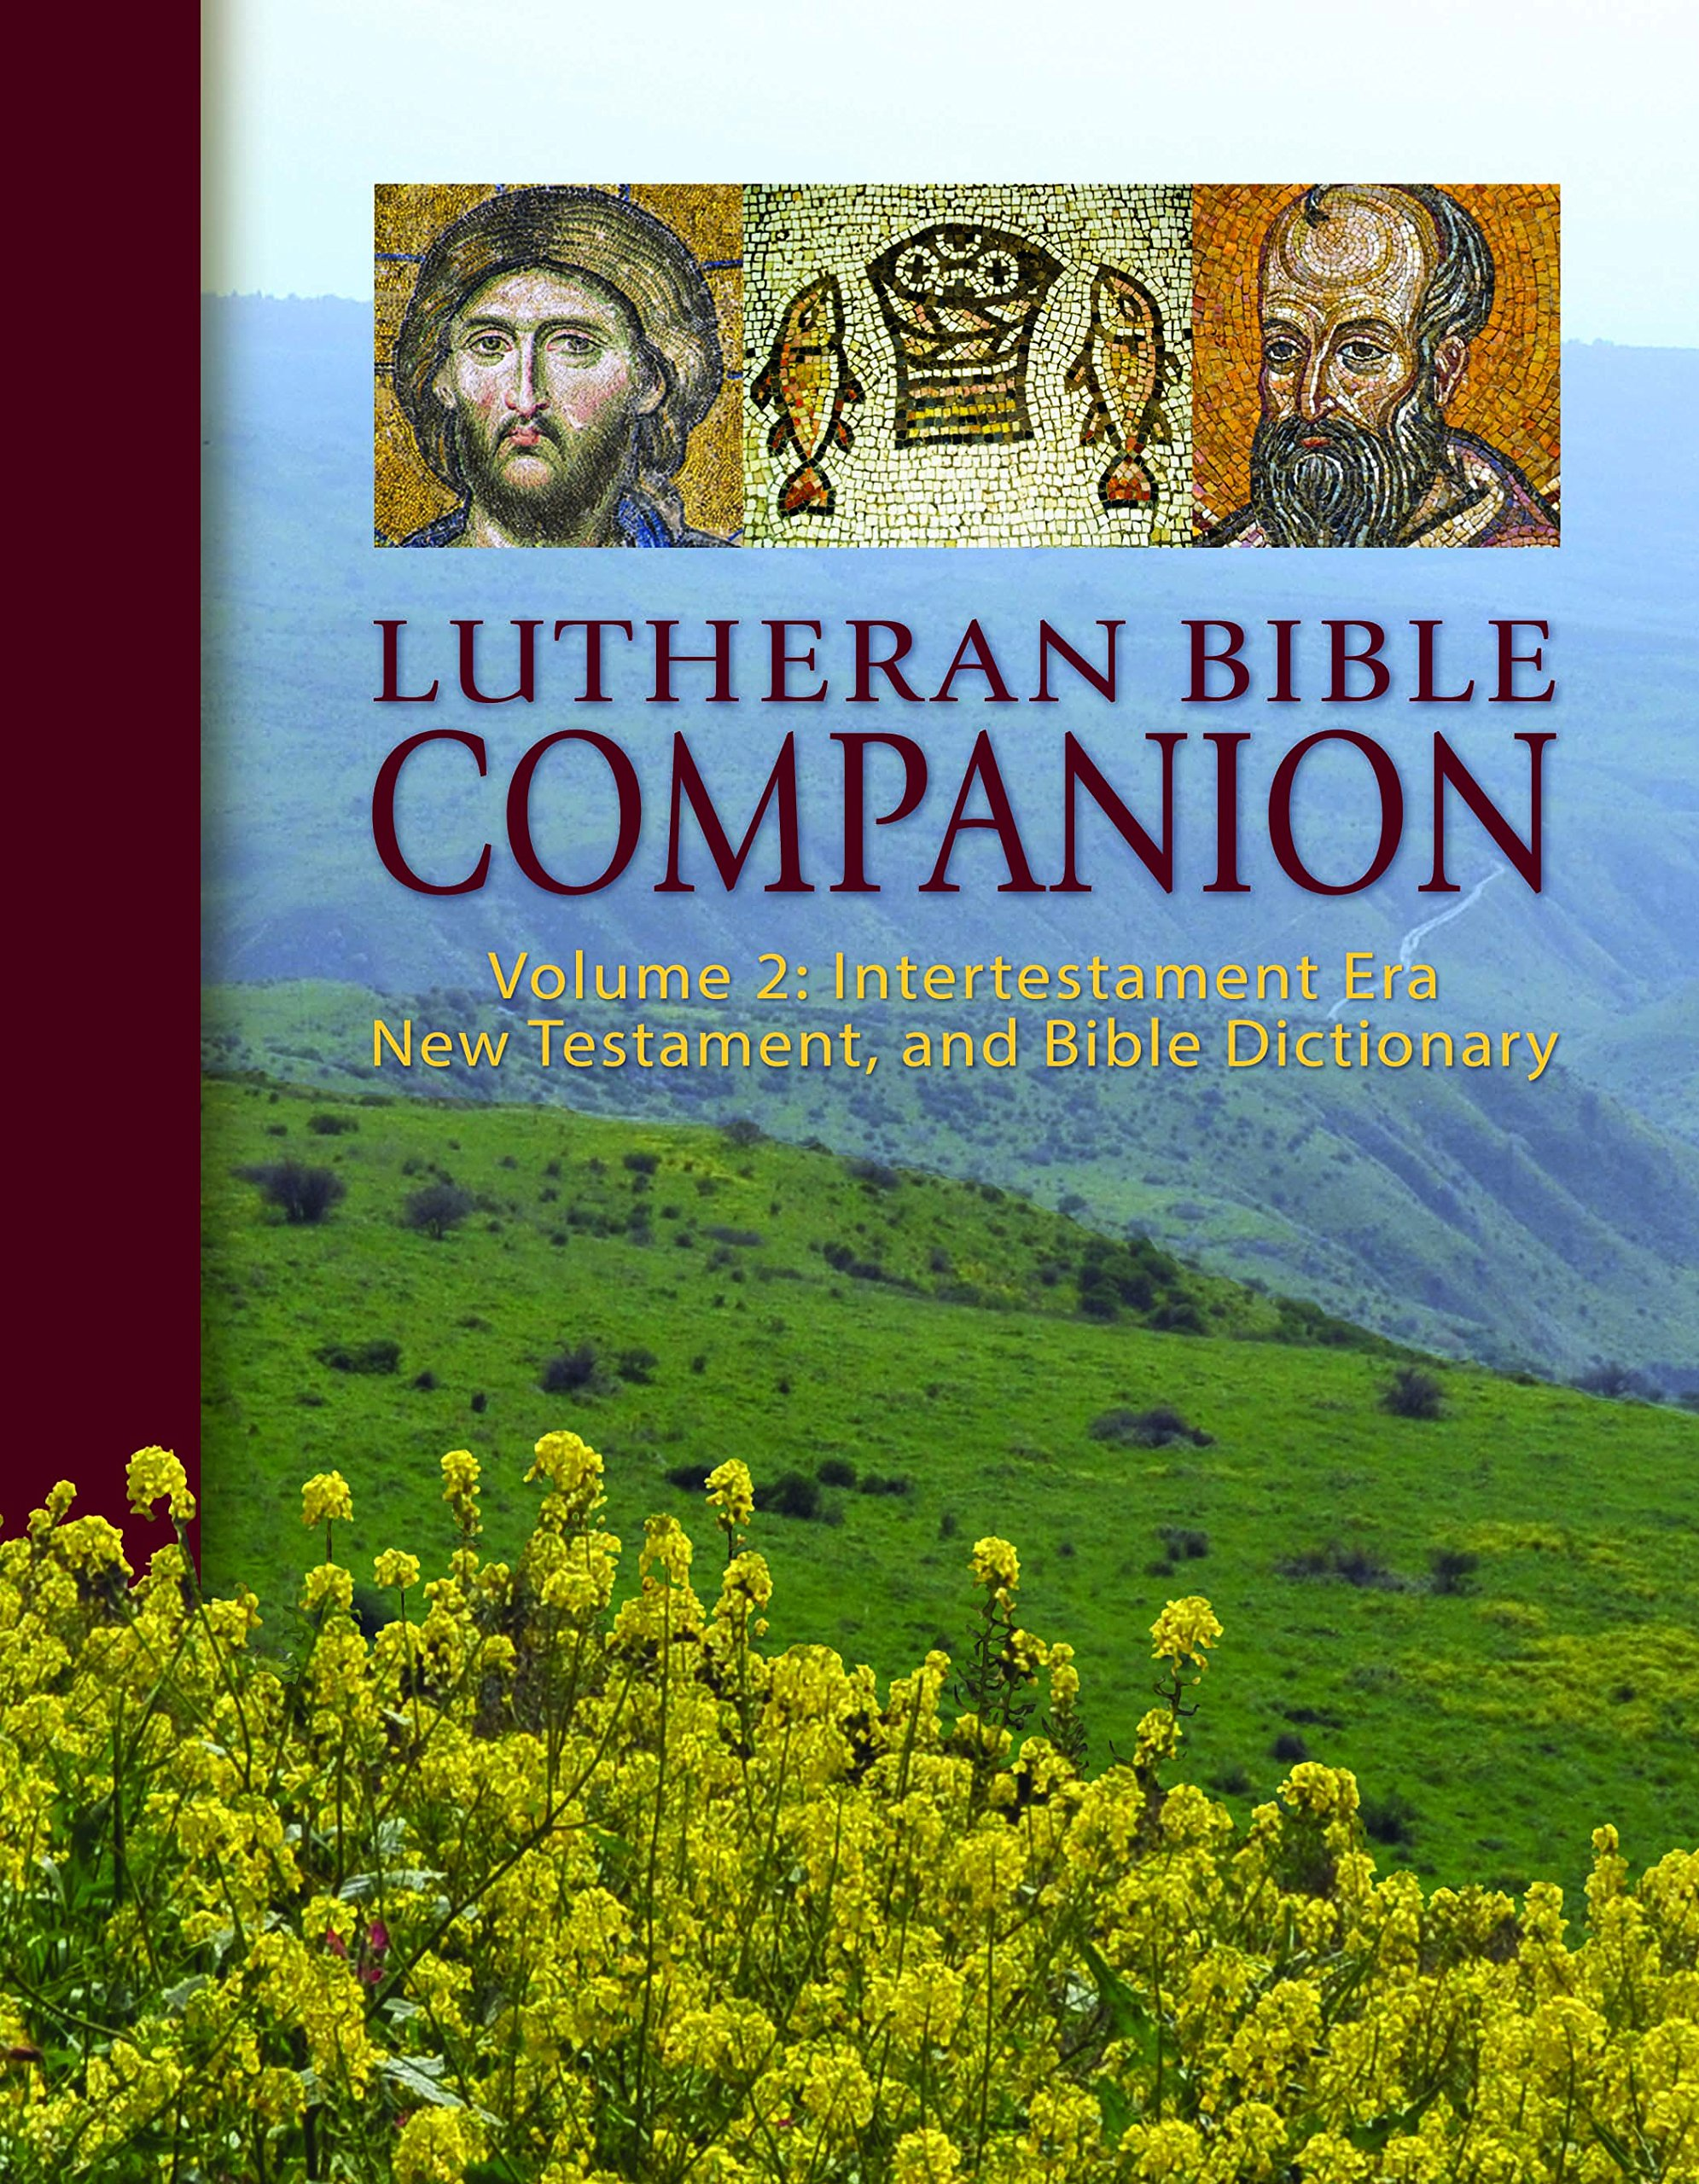 Lutheran Bible Companion Volume 2: Intertestamental, New Testament, and Bible Dictionary